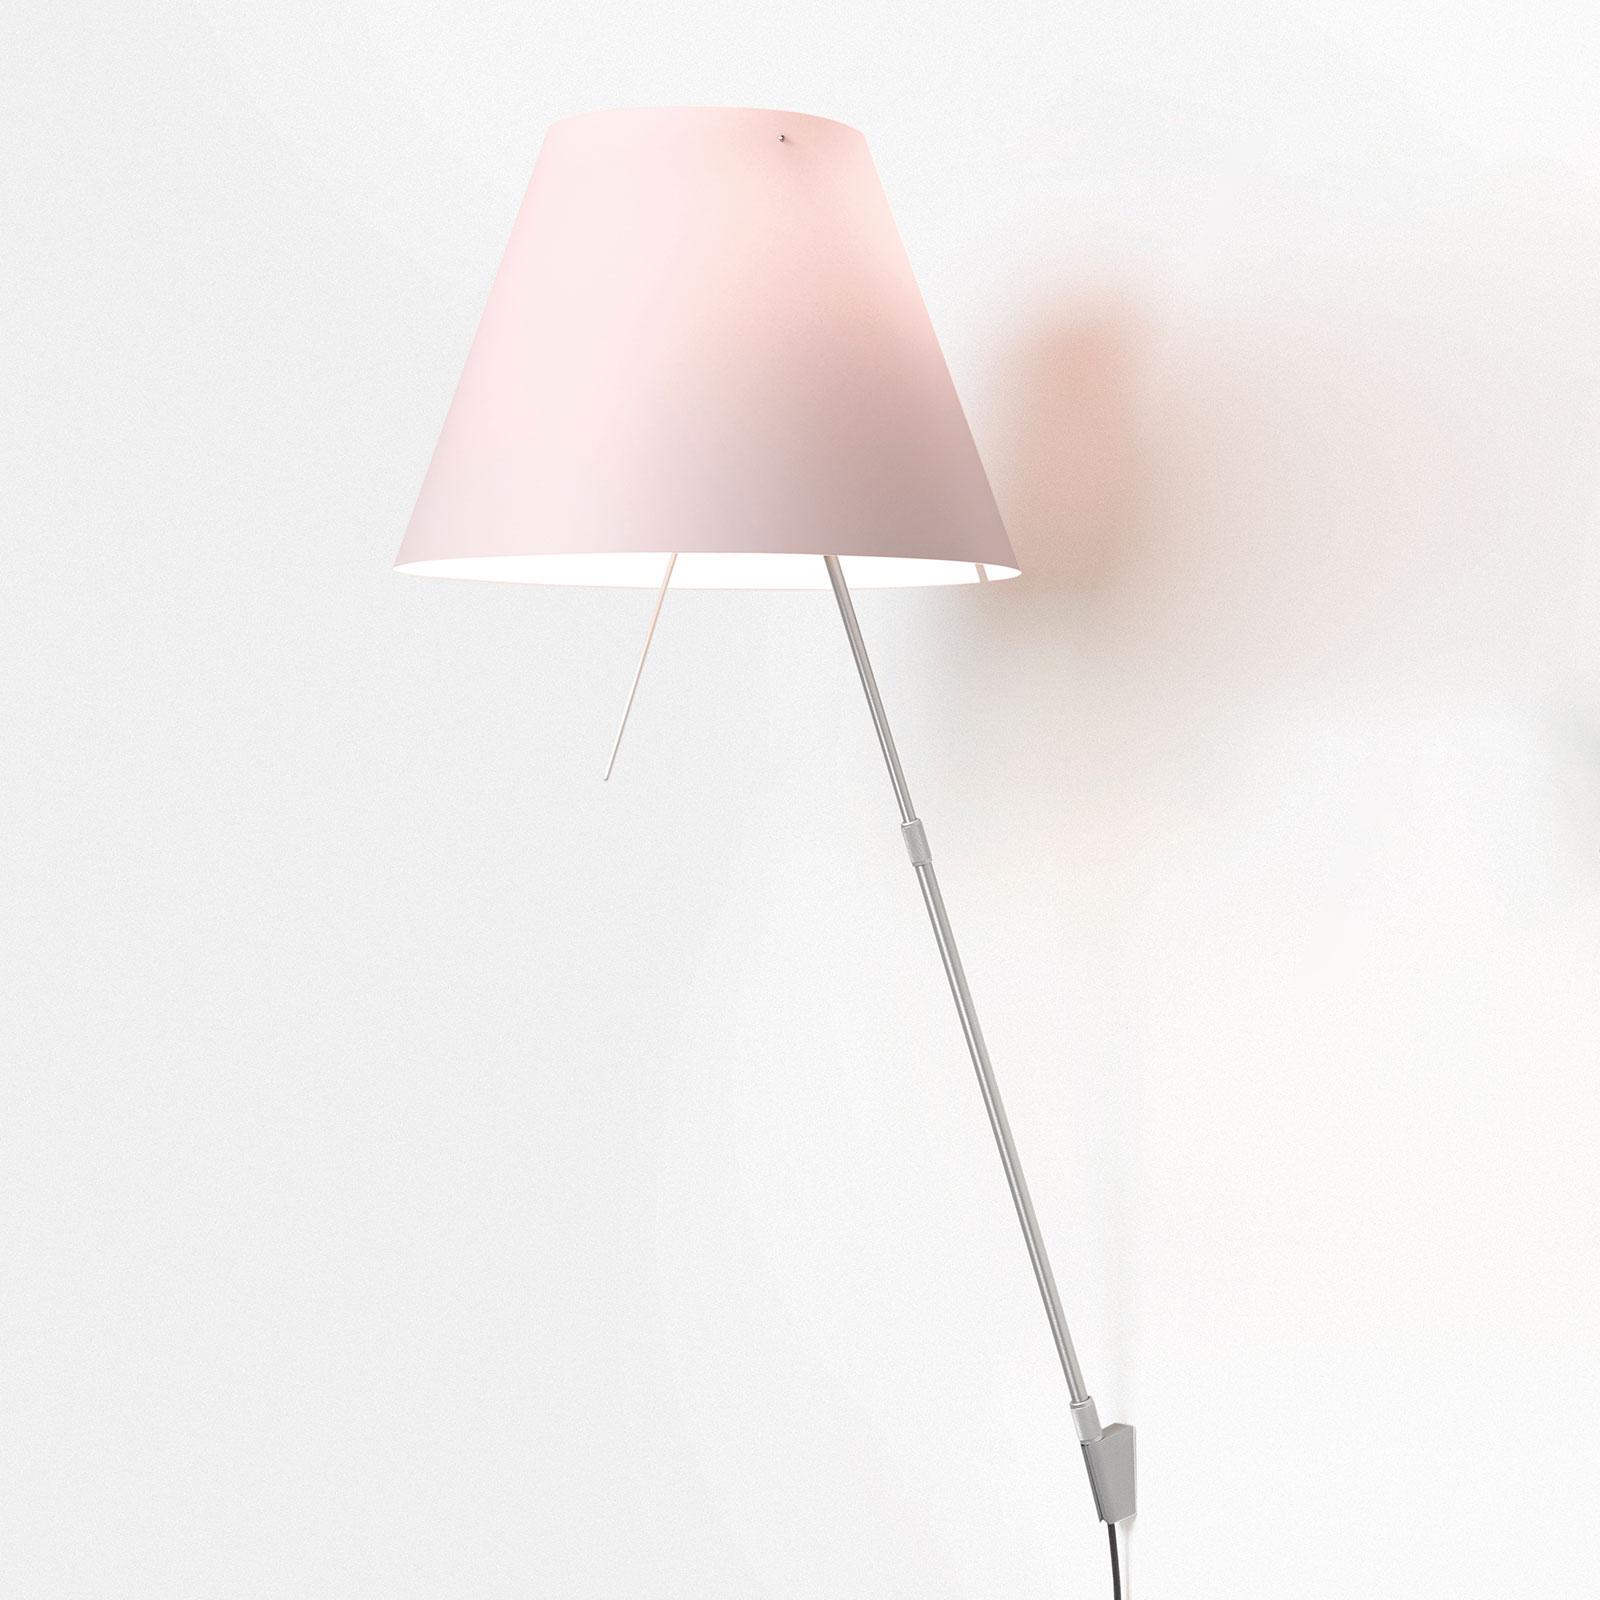 Luceplan Costanza da terra D13a, alluminio/rosa